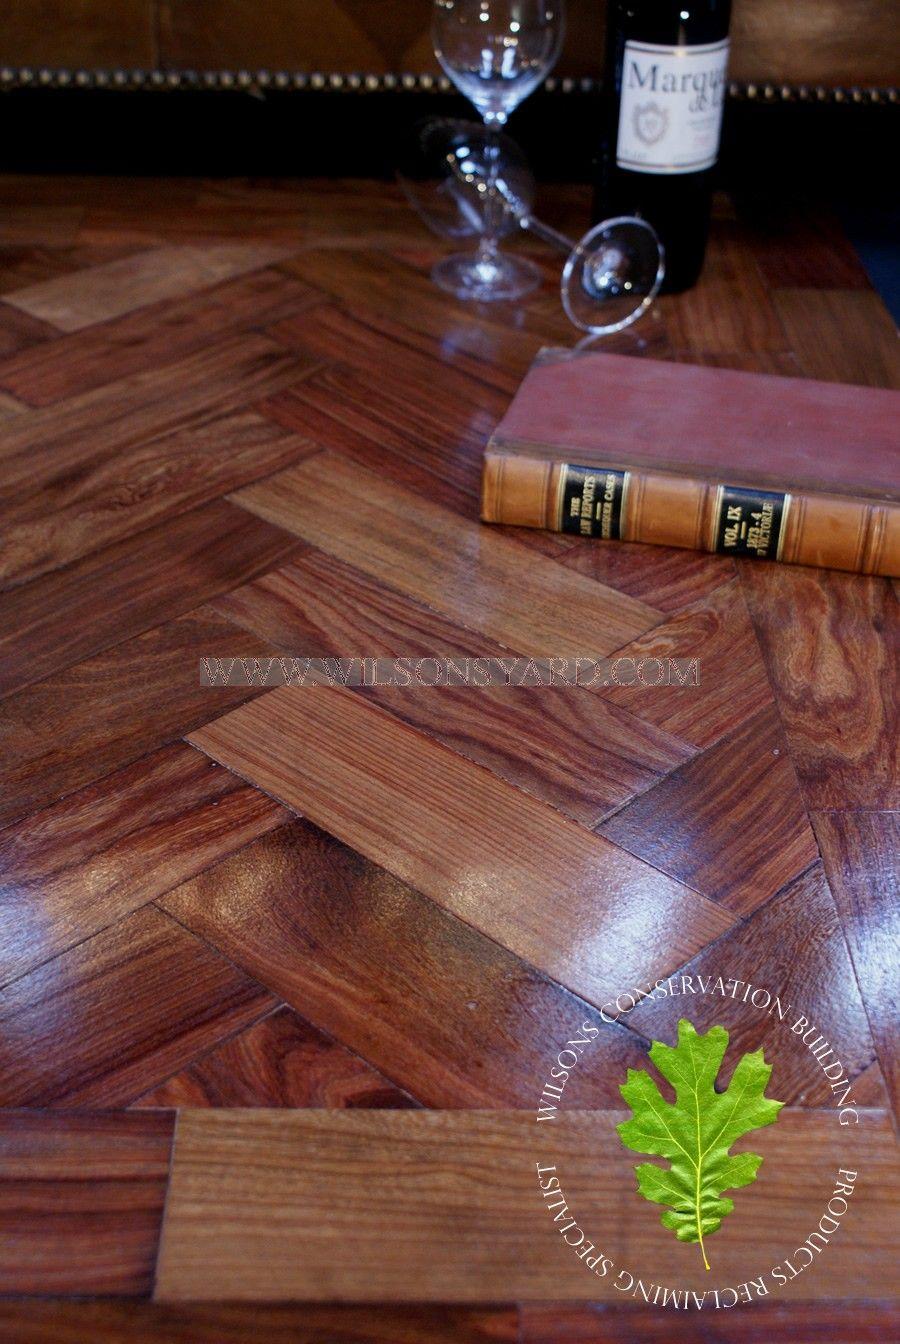 A Beautiful East African Hardwood Parquet Woodblock